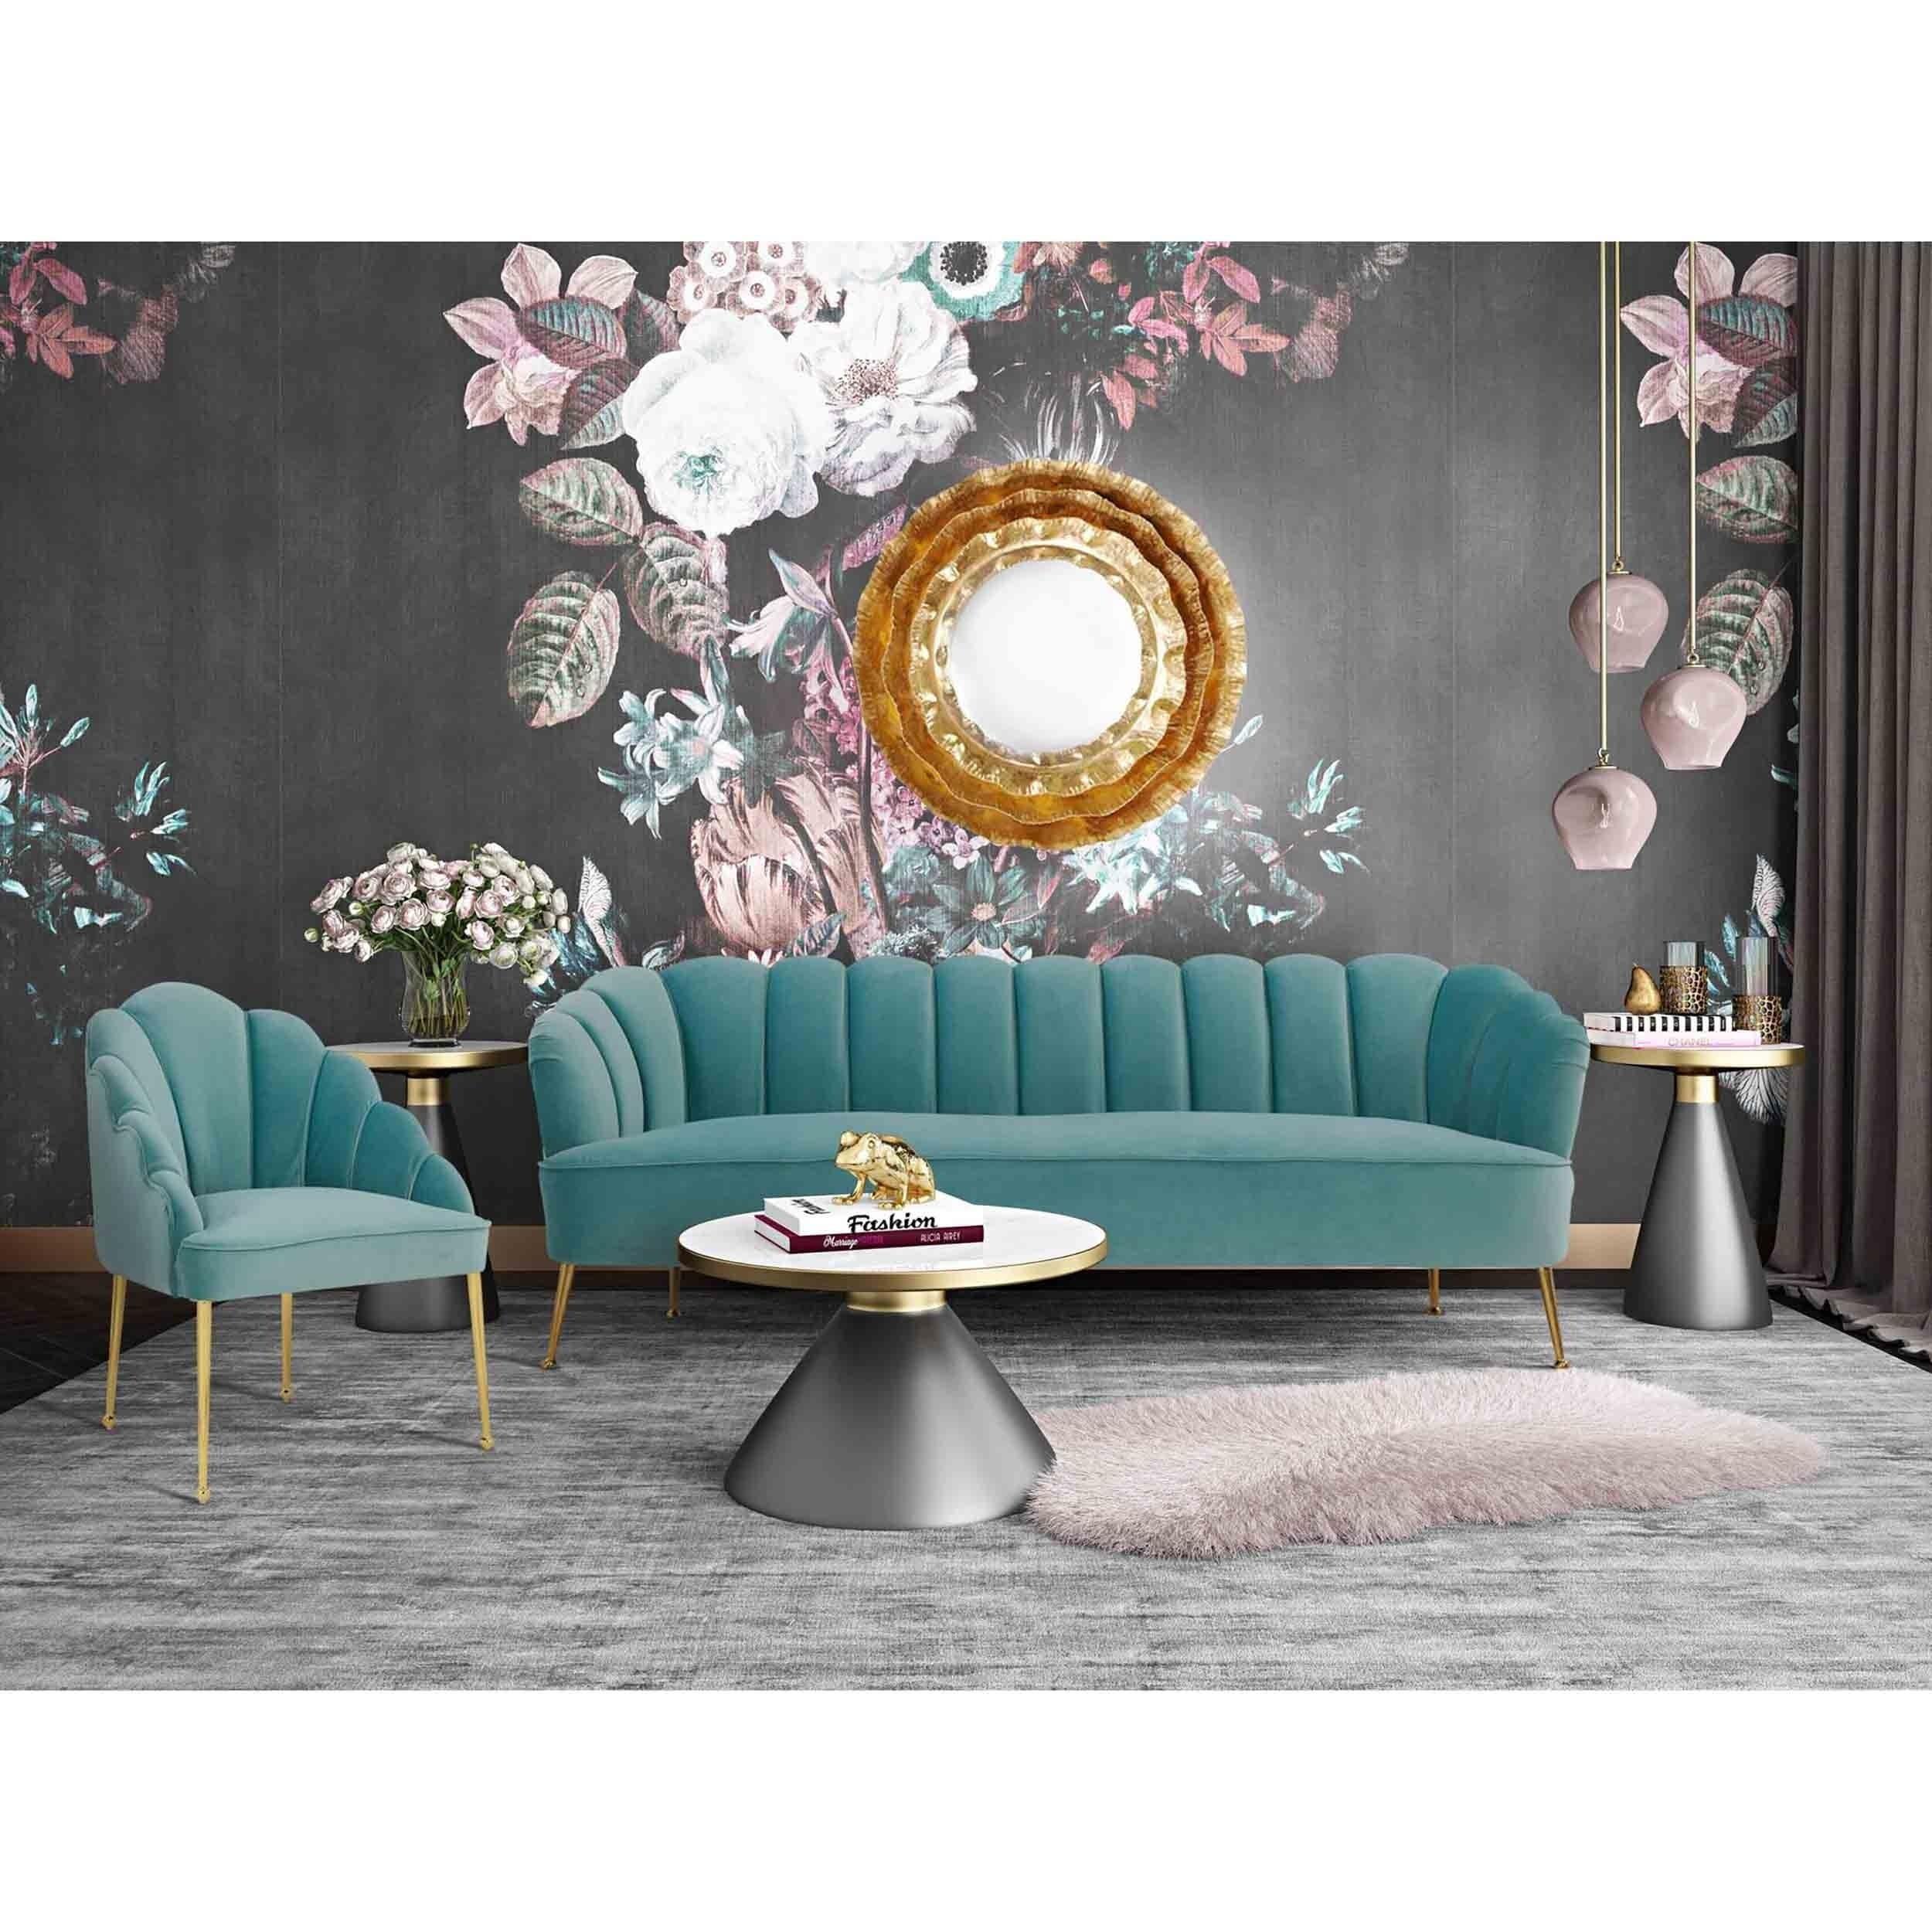 Ella Petite Sofa Sea Blue In 2021 Blue Velvet Chairs Living Room Sets Blue Velvet Sofa Petite furniture living room